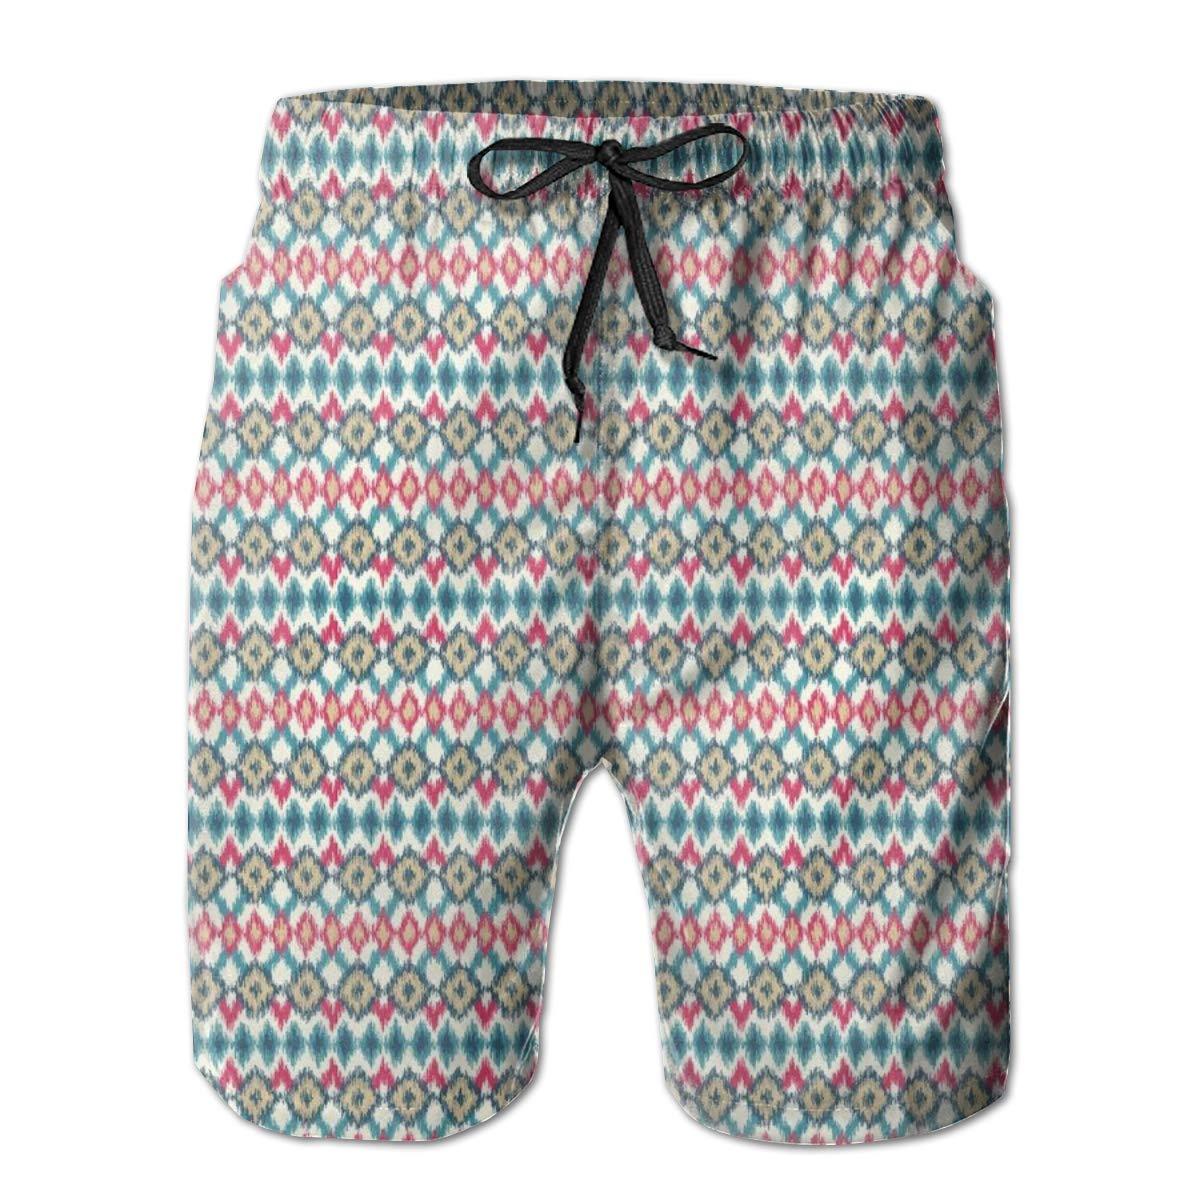 lsrIYzy Men Swim Trunks Beach Shorts,Authentic Mandala Inspired Composition Man Posture Asana Meditation Print